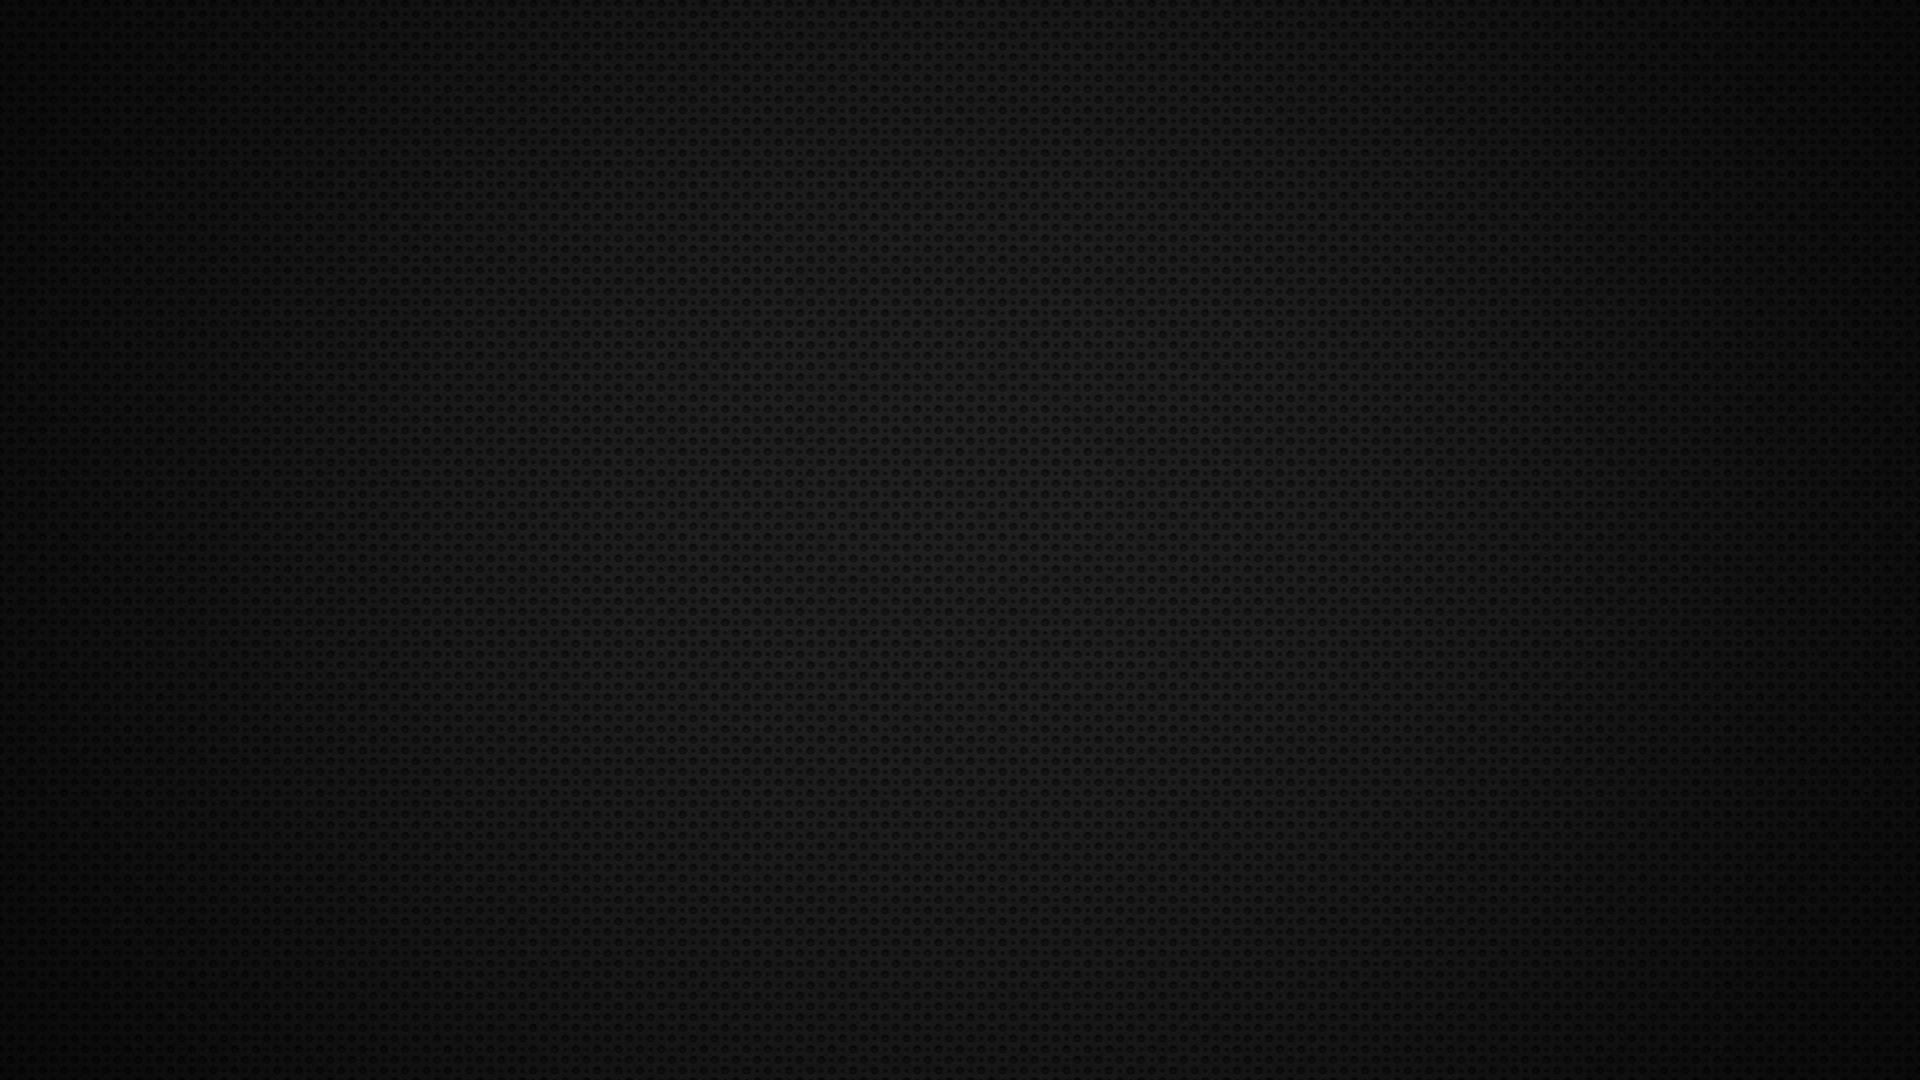 black pattern background mac wallpaper download free mac